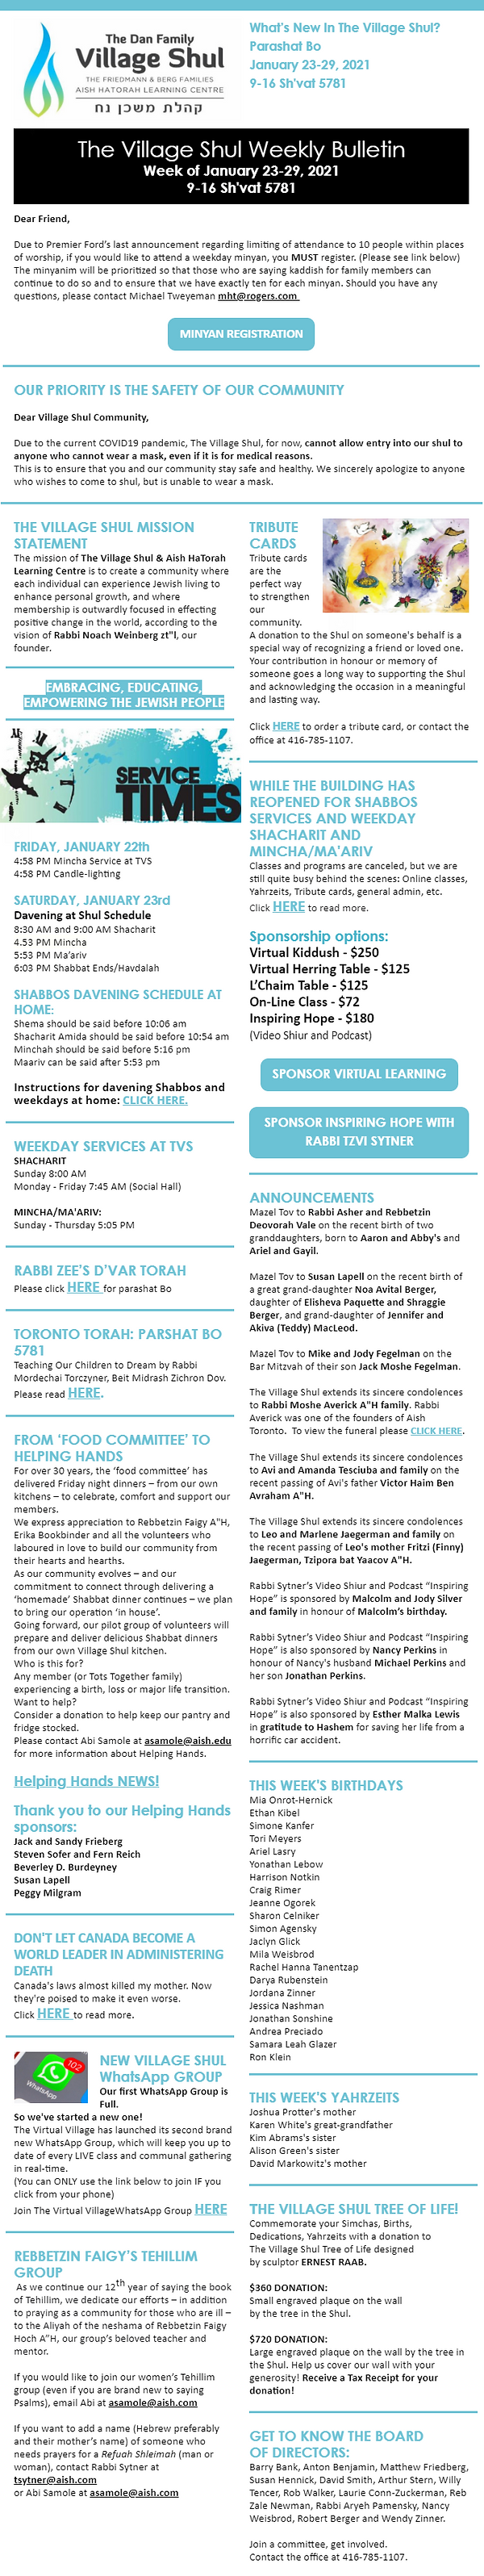 The-Village-Shul-Weekly-Bulletin-January